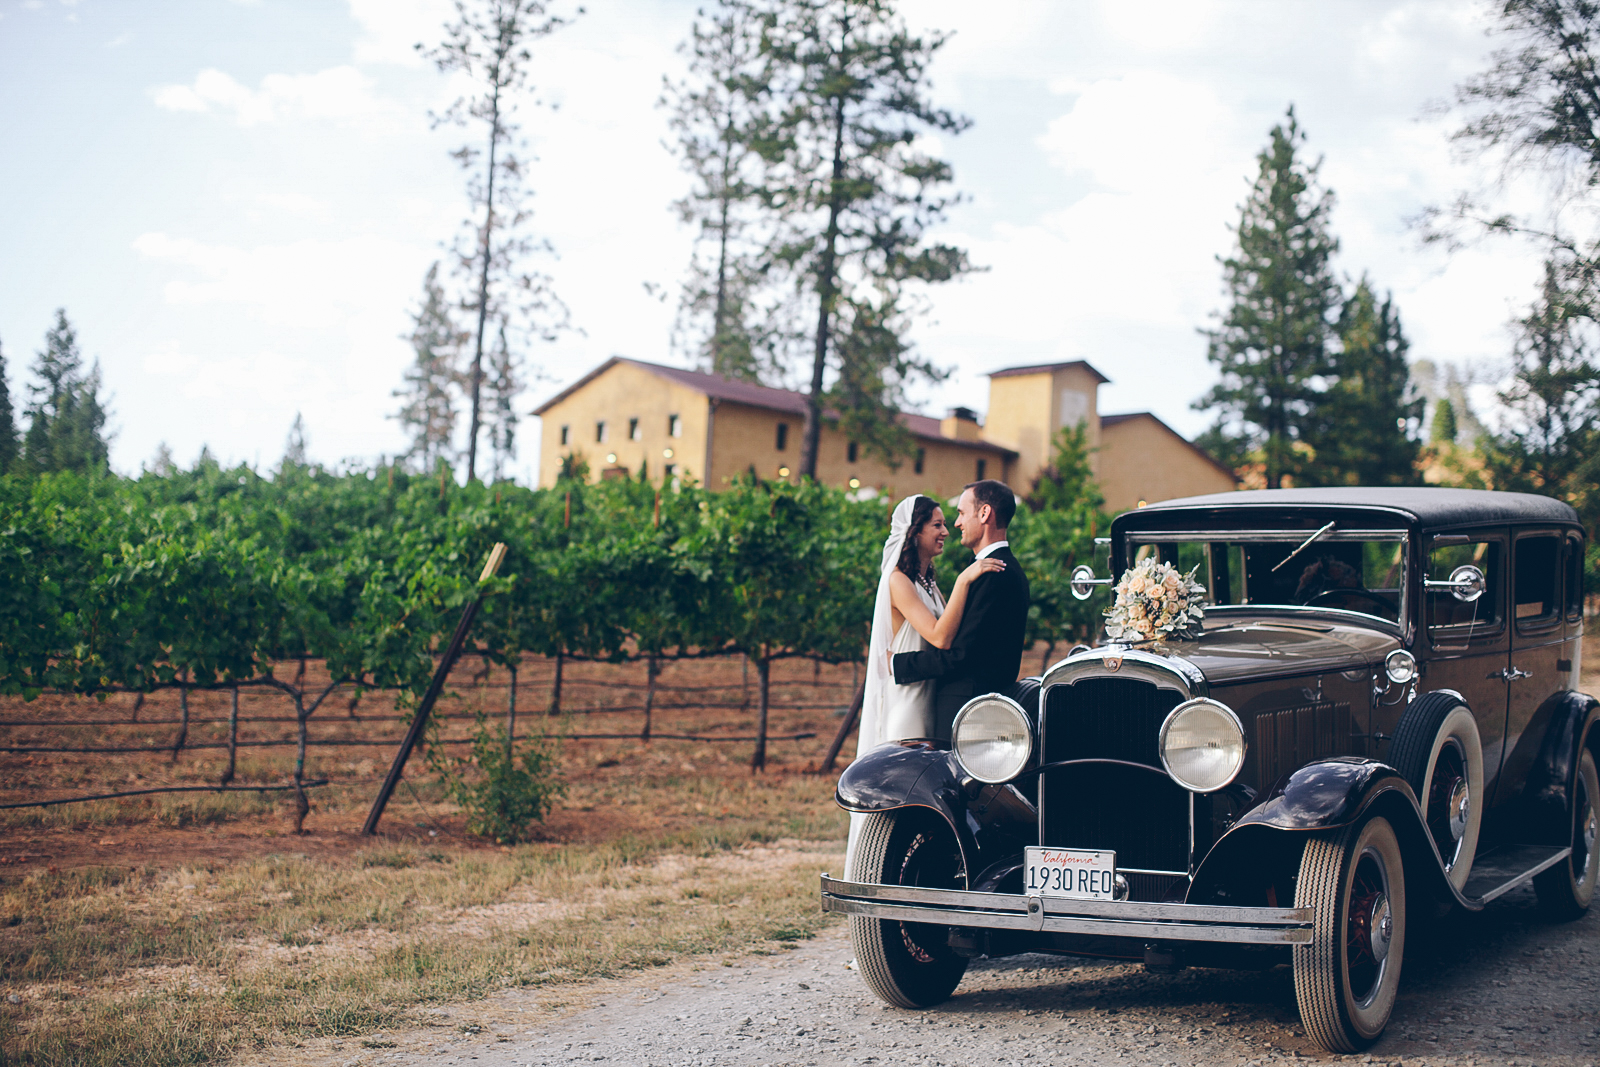 miraflores_winery_wedding_photography_ian_melissa_ebony_siovhan_bokeh_photography_41.jpg